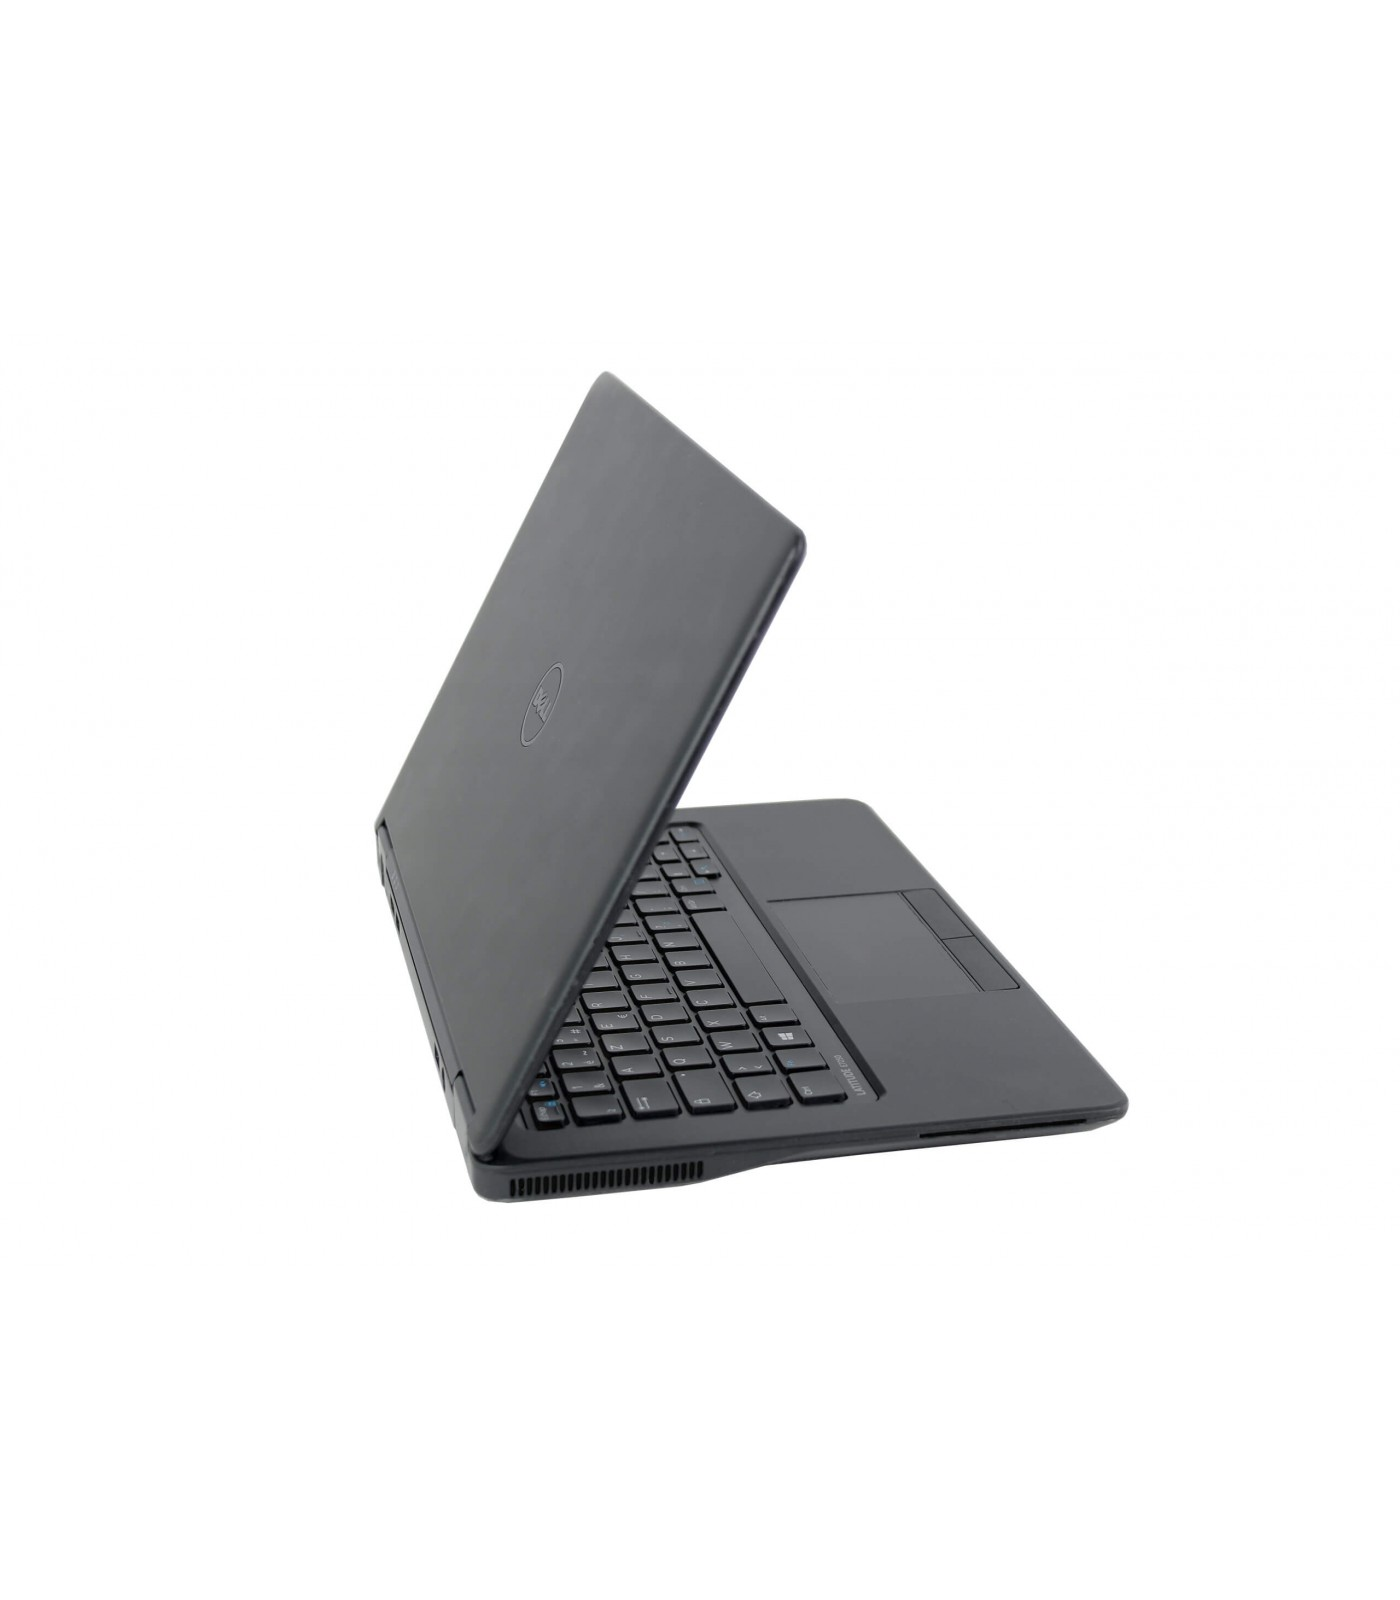 Poleasingowy laptop Dell Latitude E7250 z Intel Core i5-5300U w Klasie A-.